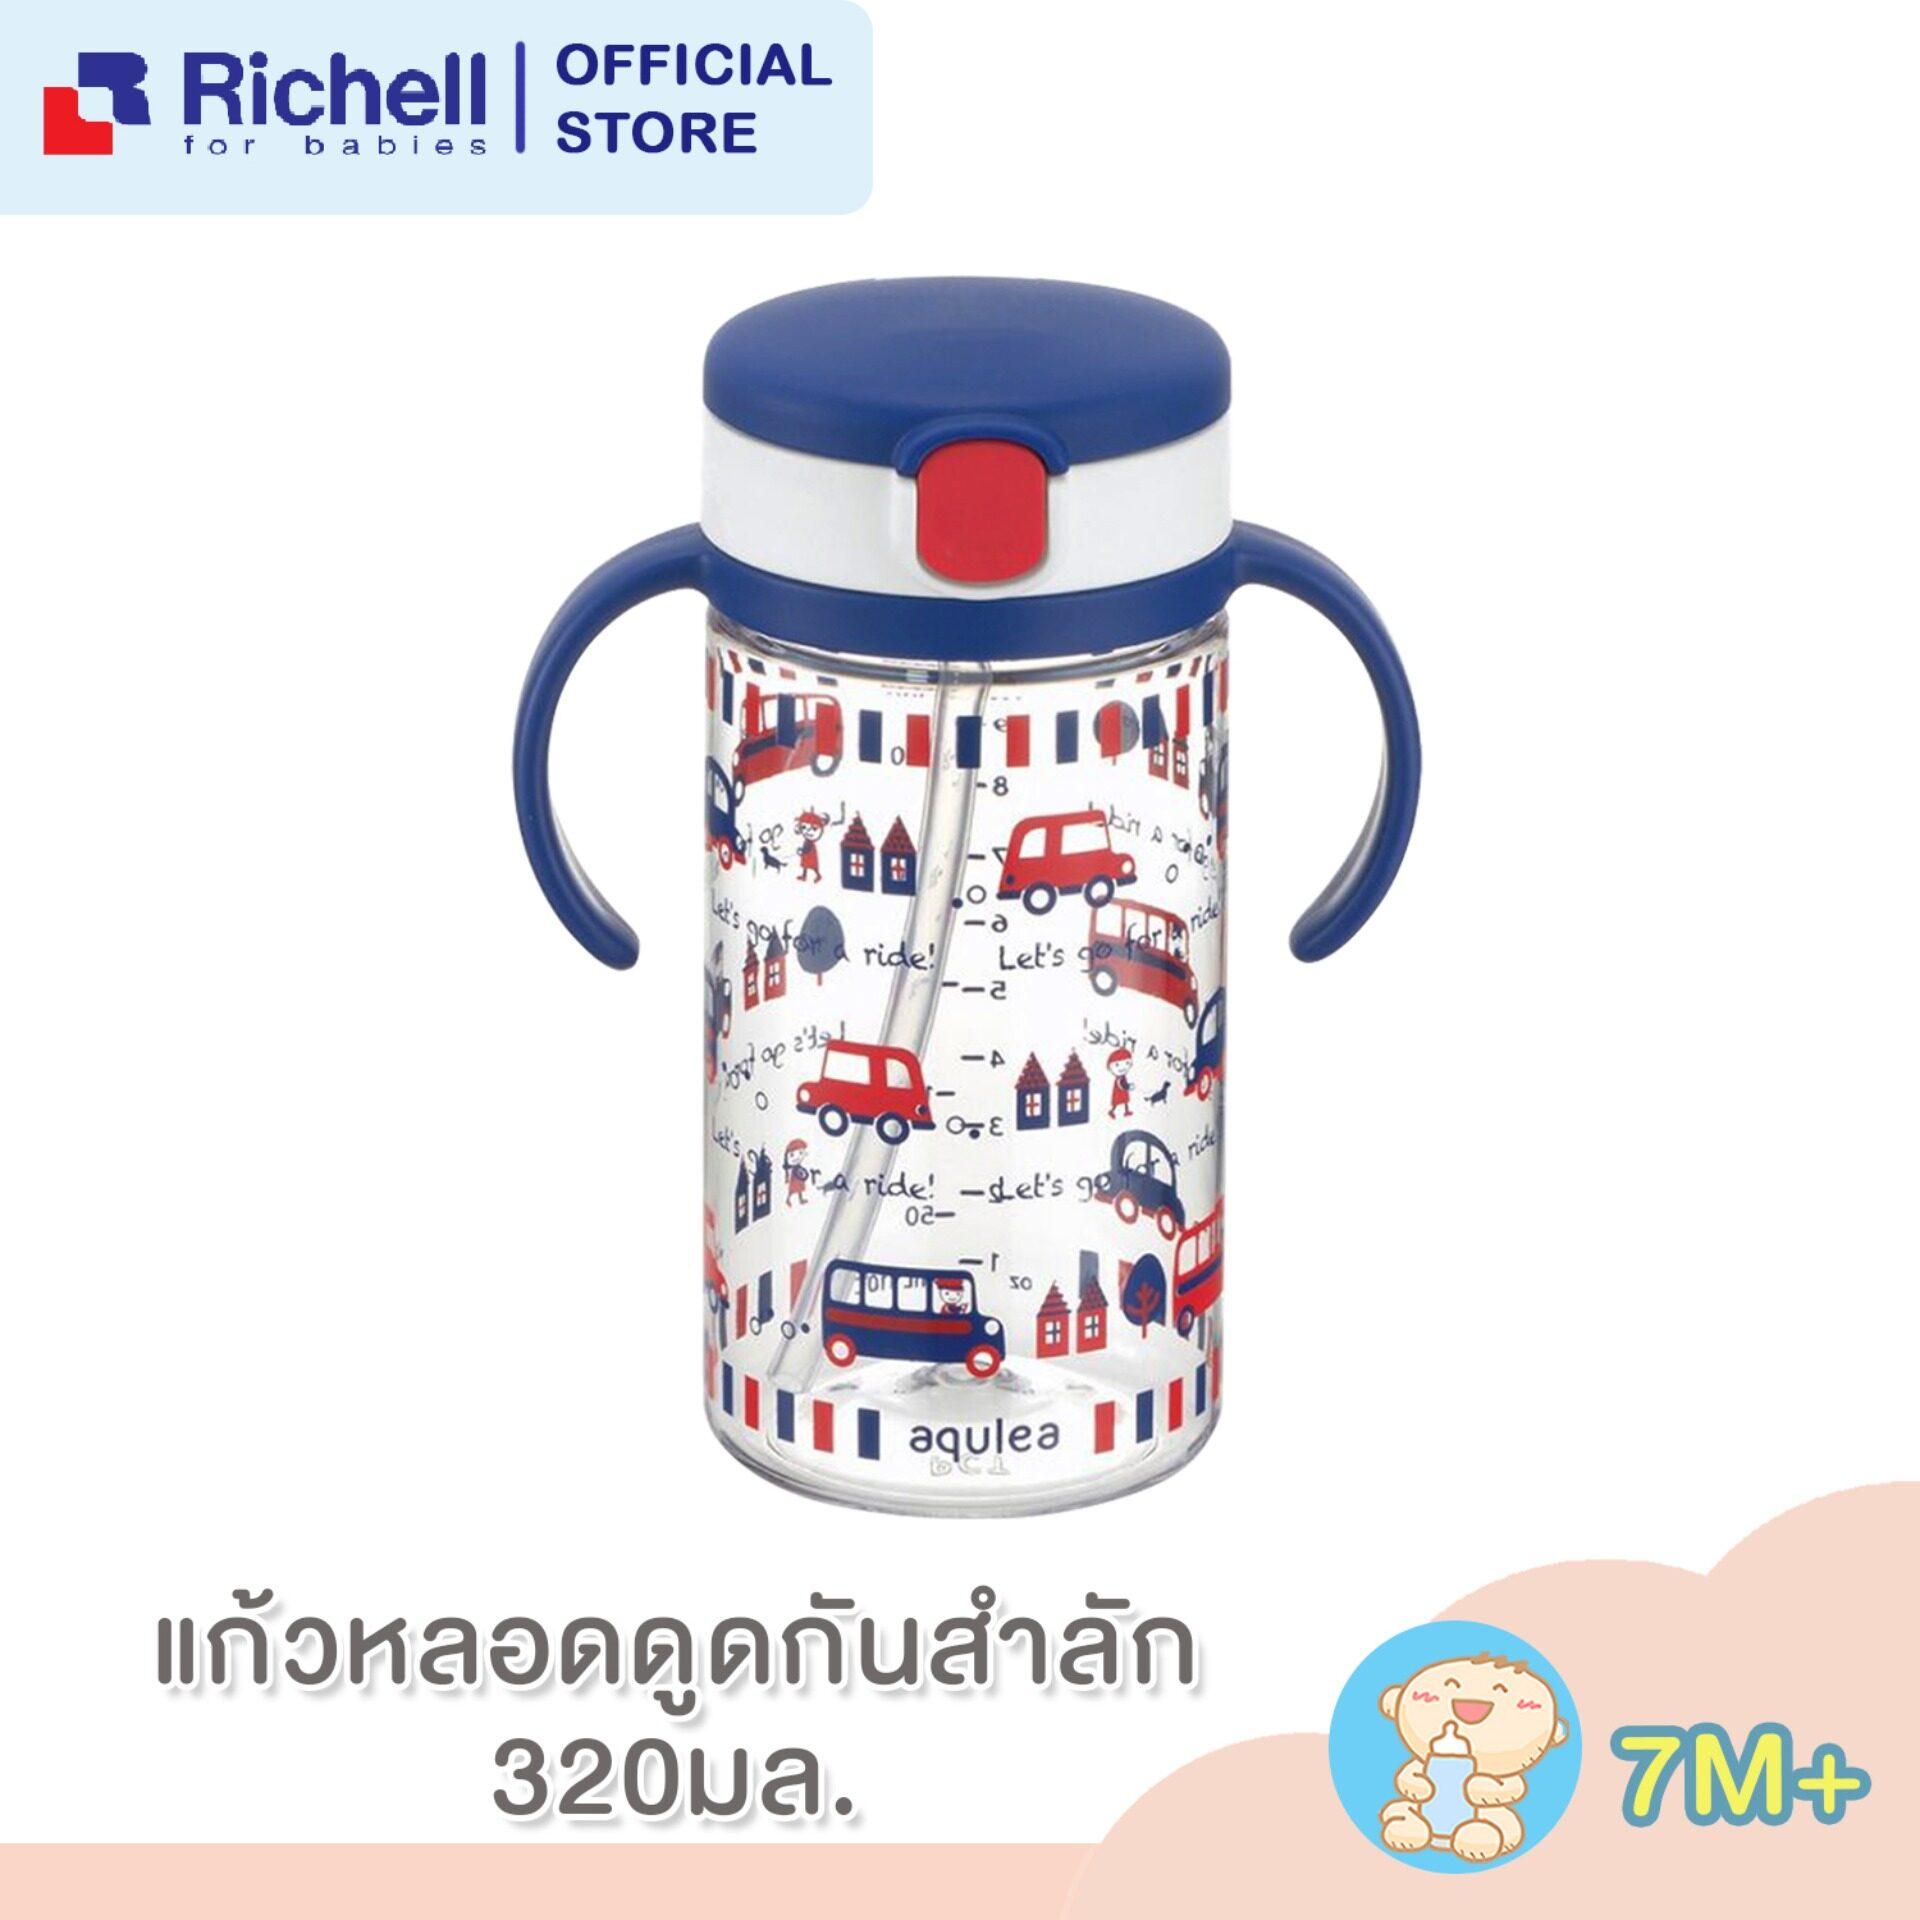 Richell ริเชล (ริชเชล/รีเชล) แก้วหลอดดูดกันสำลัก Aq Clear Straw Bottle Mug 320r แก้วกันสำลัก แก้วสูญญากาศ ขนาด 320 Ml พกพาสะดวก แก้วทรงสูง.